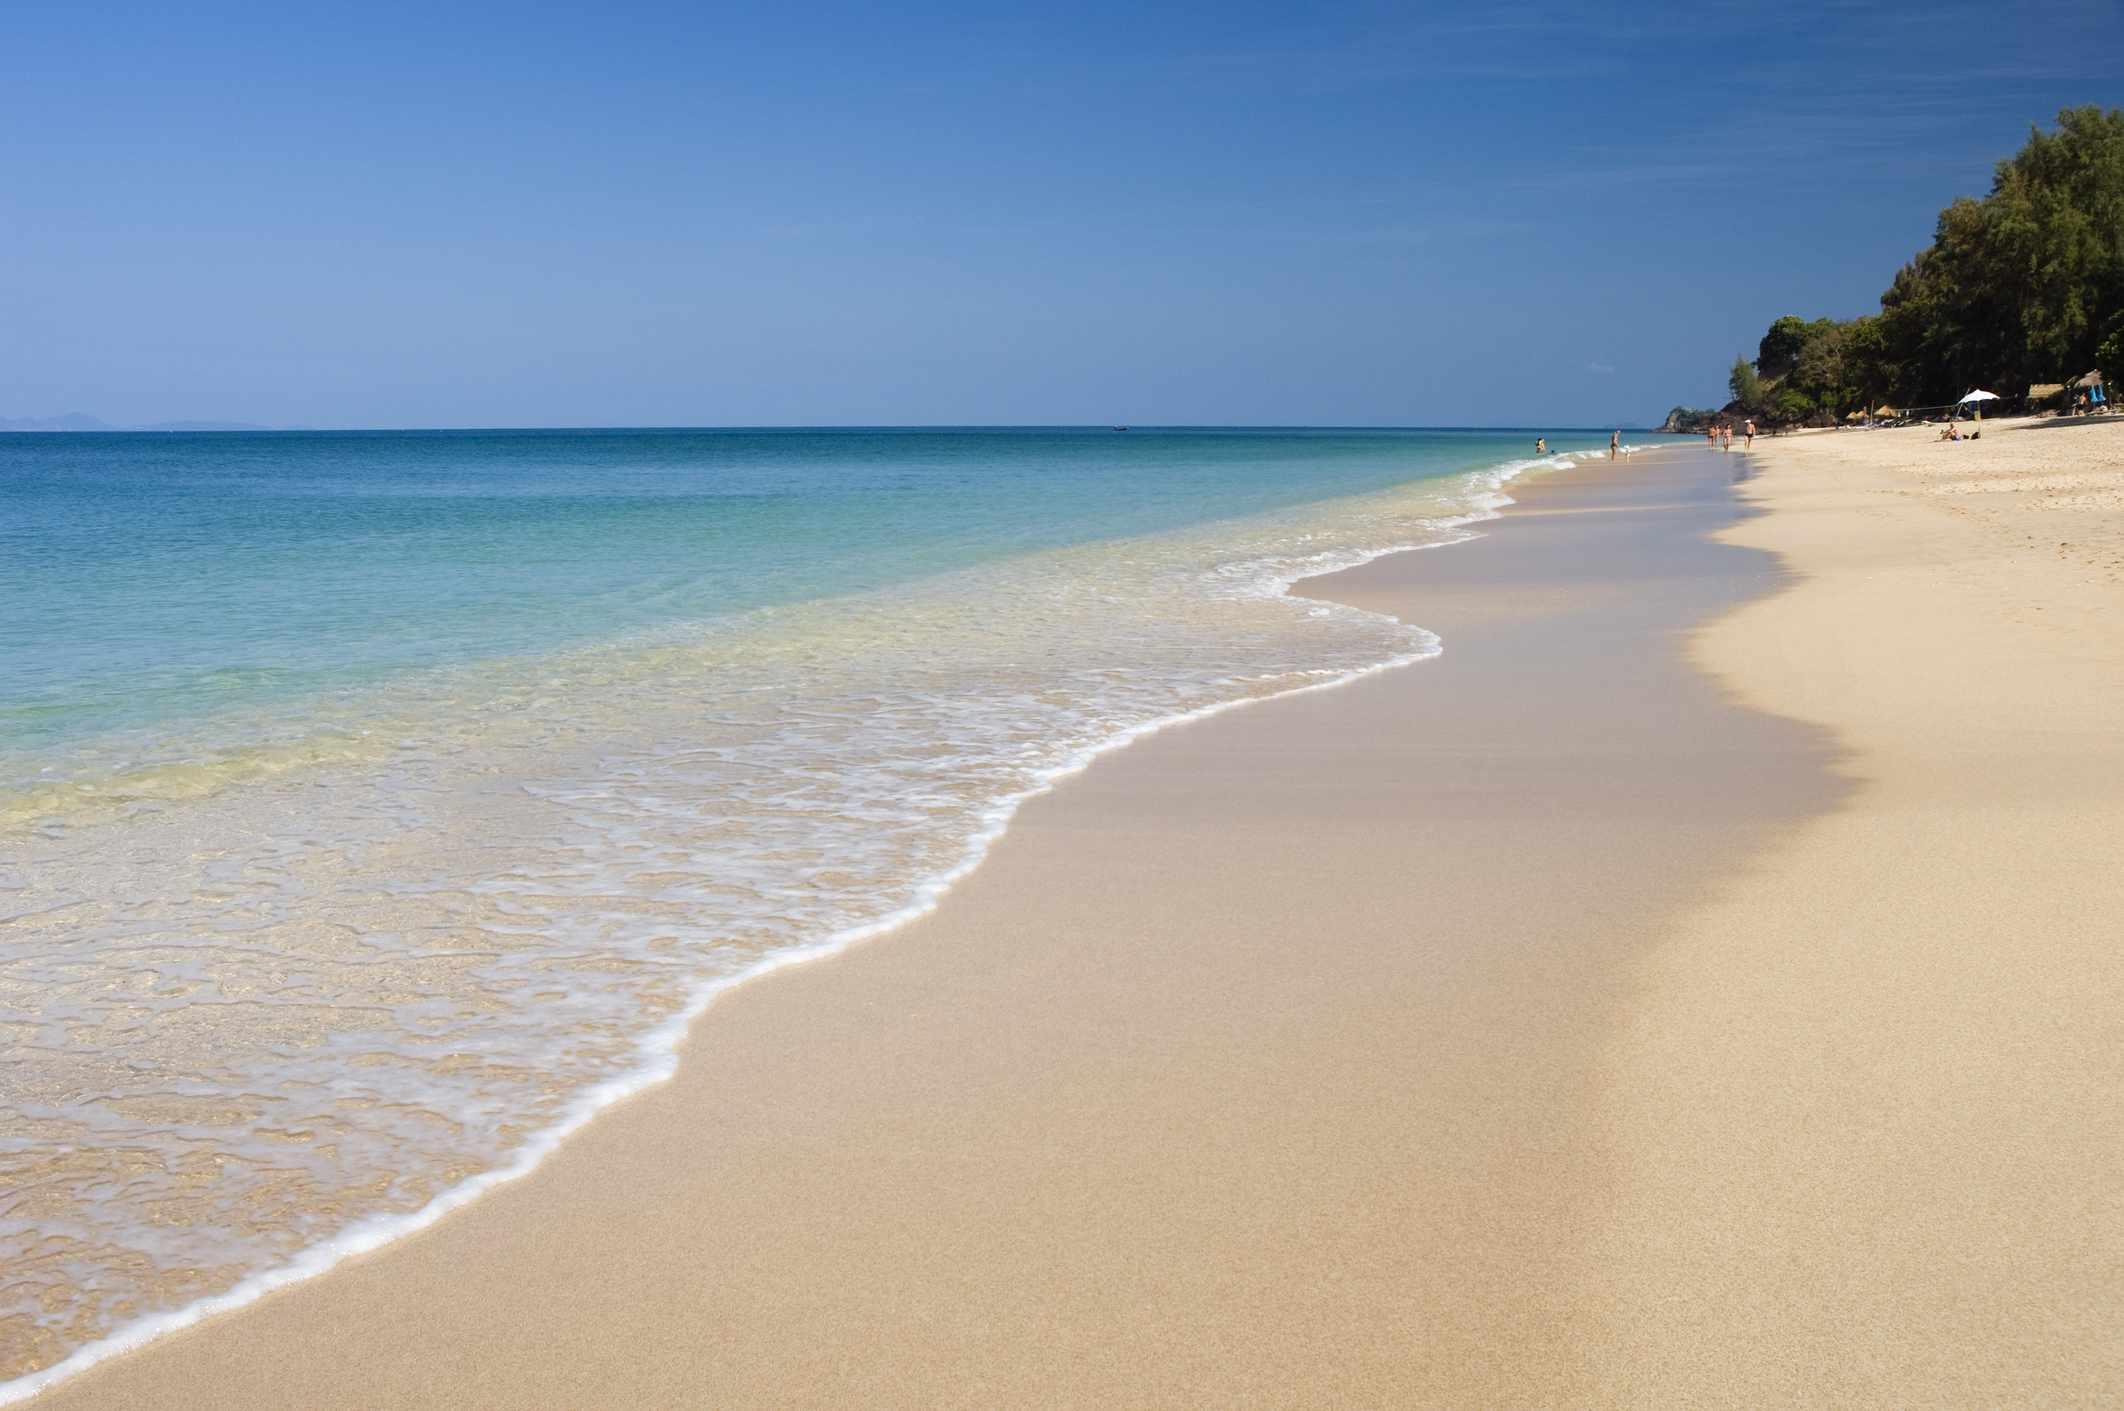 Pristine sand and gentle waves on Long Beach, Koh Lanta, Thailand